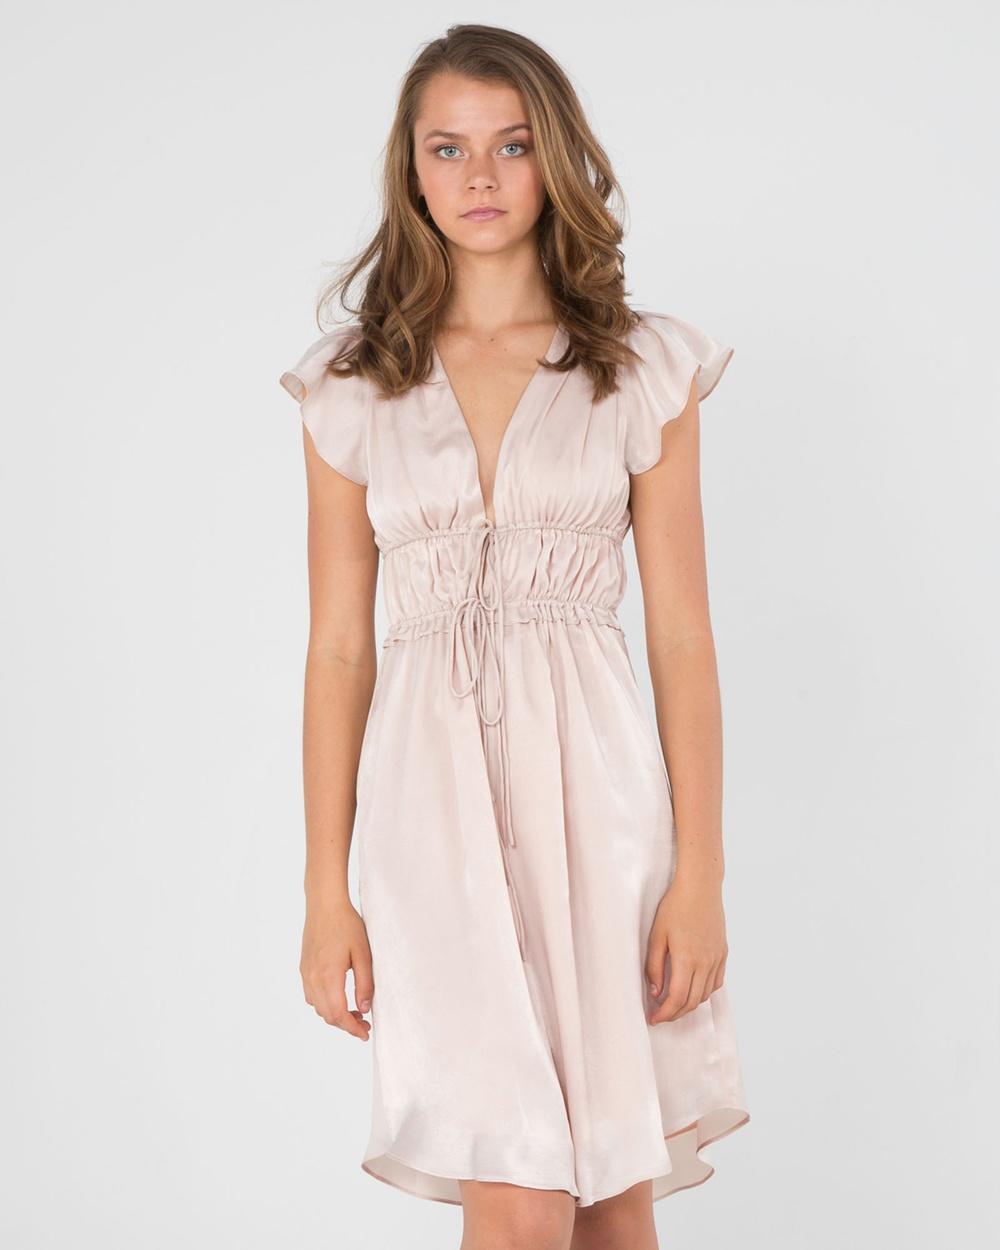 Amelius Athena Dress Dresses Blush Athena Dress